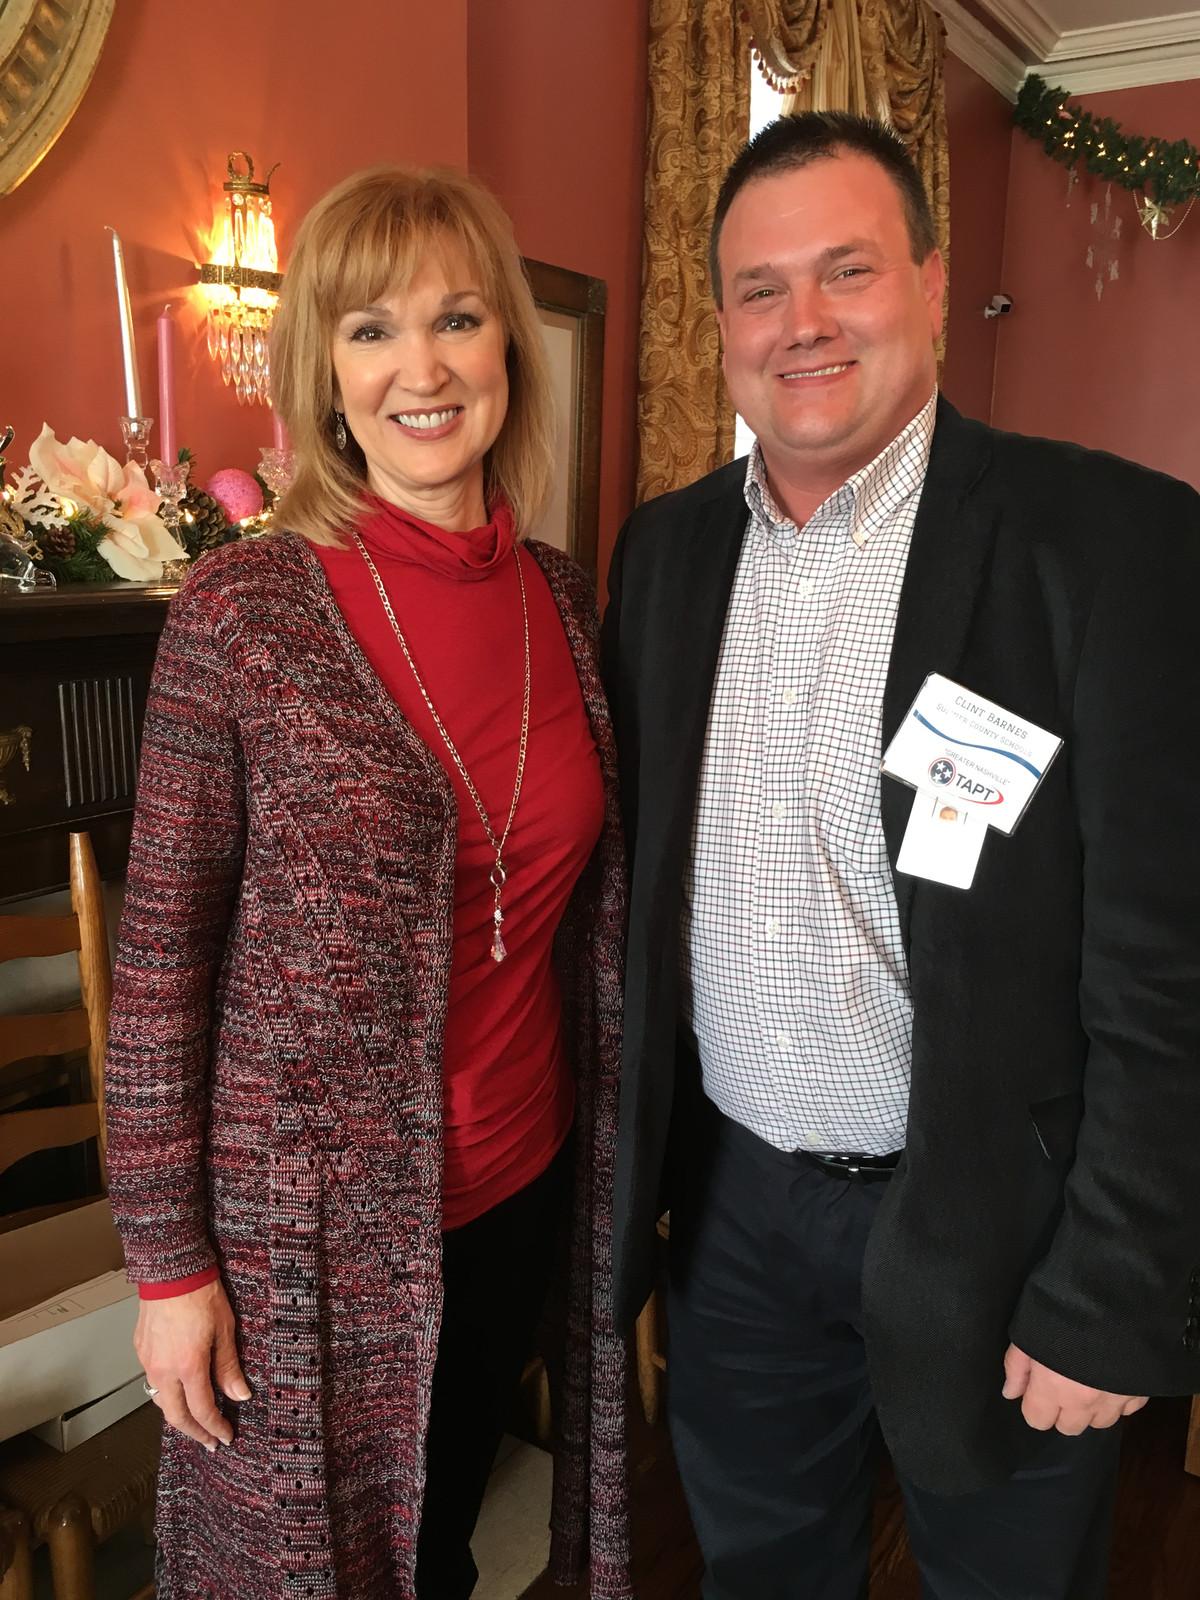 TAPT President Clint Banes & Lisa Spencer News Channel 4